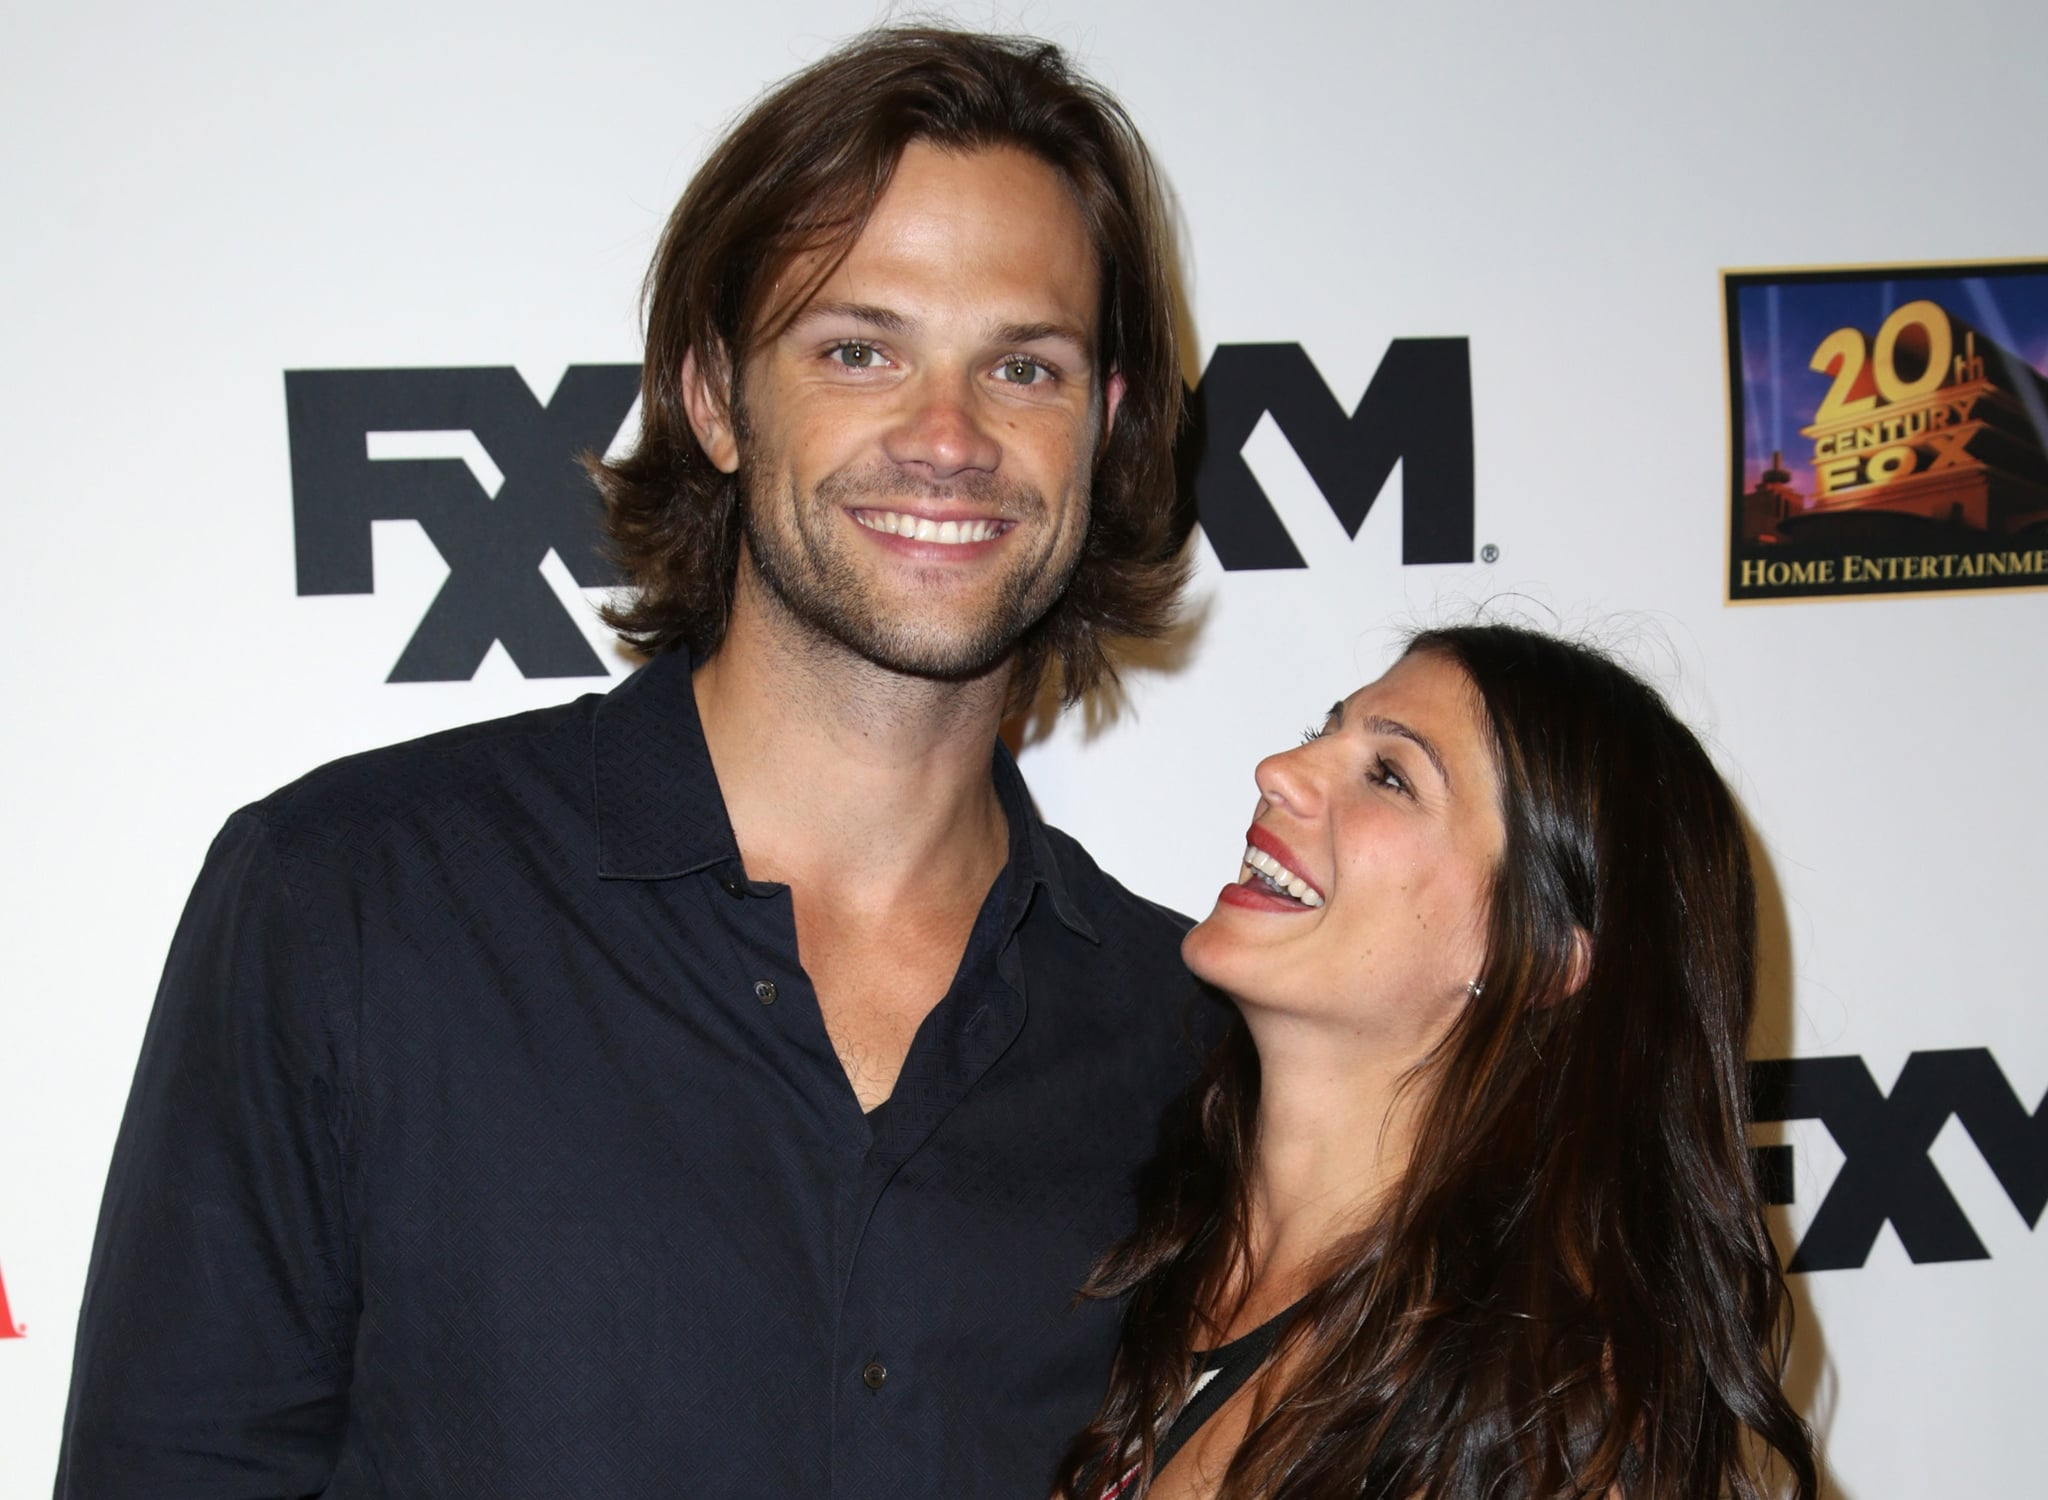 Jared Padalecki and his wife Genevieve